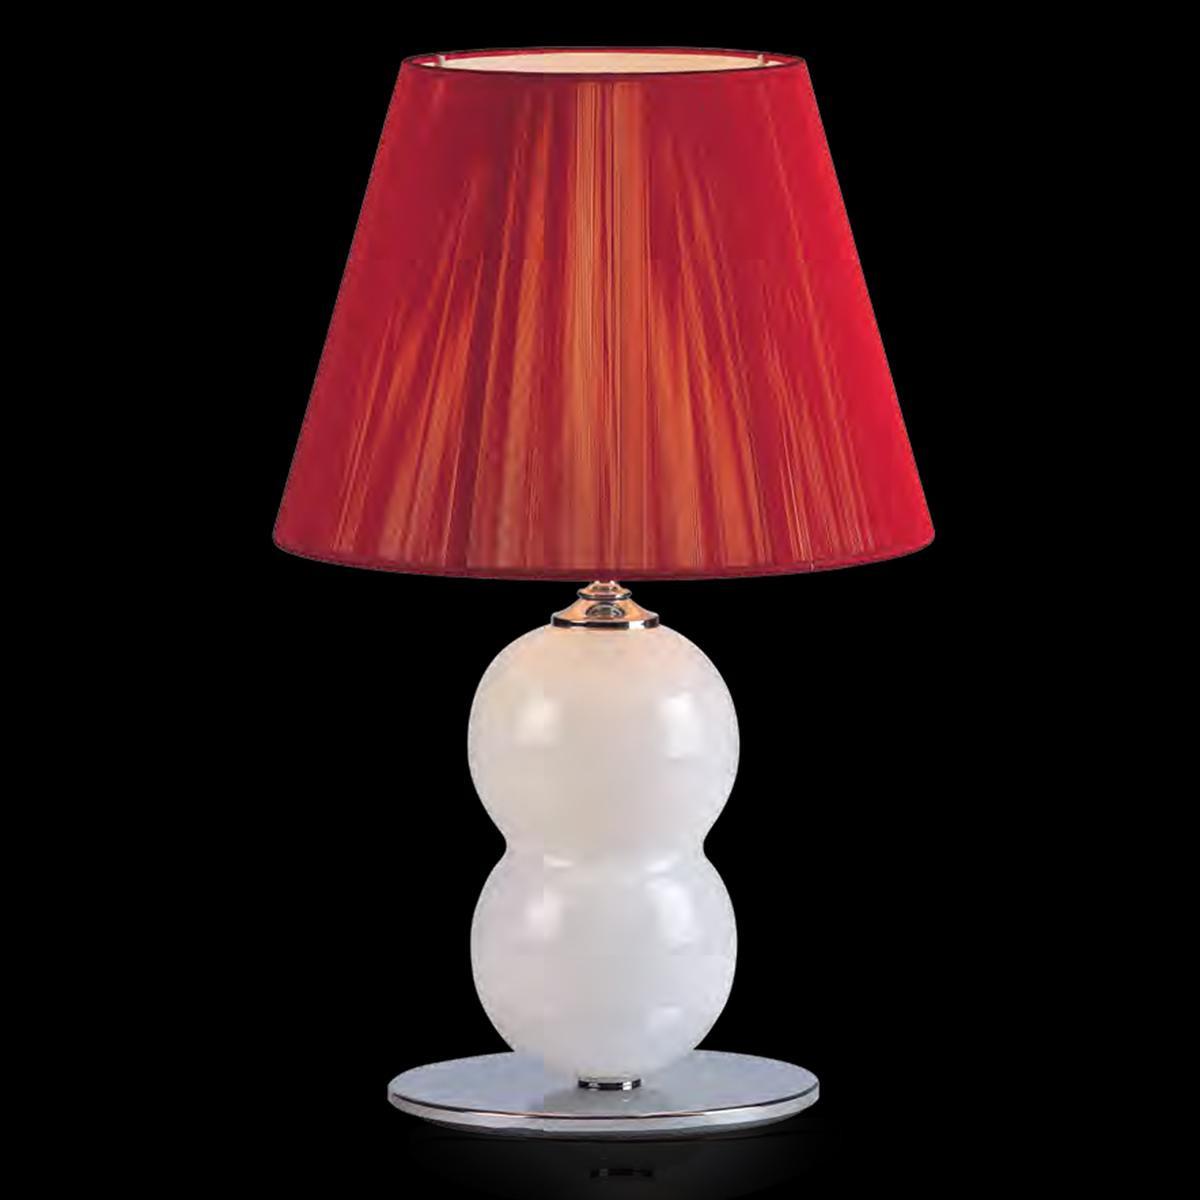 """Yolonda"" lampe de chevet en verre de Murano - 1 lumière - blanc"